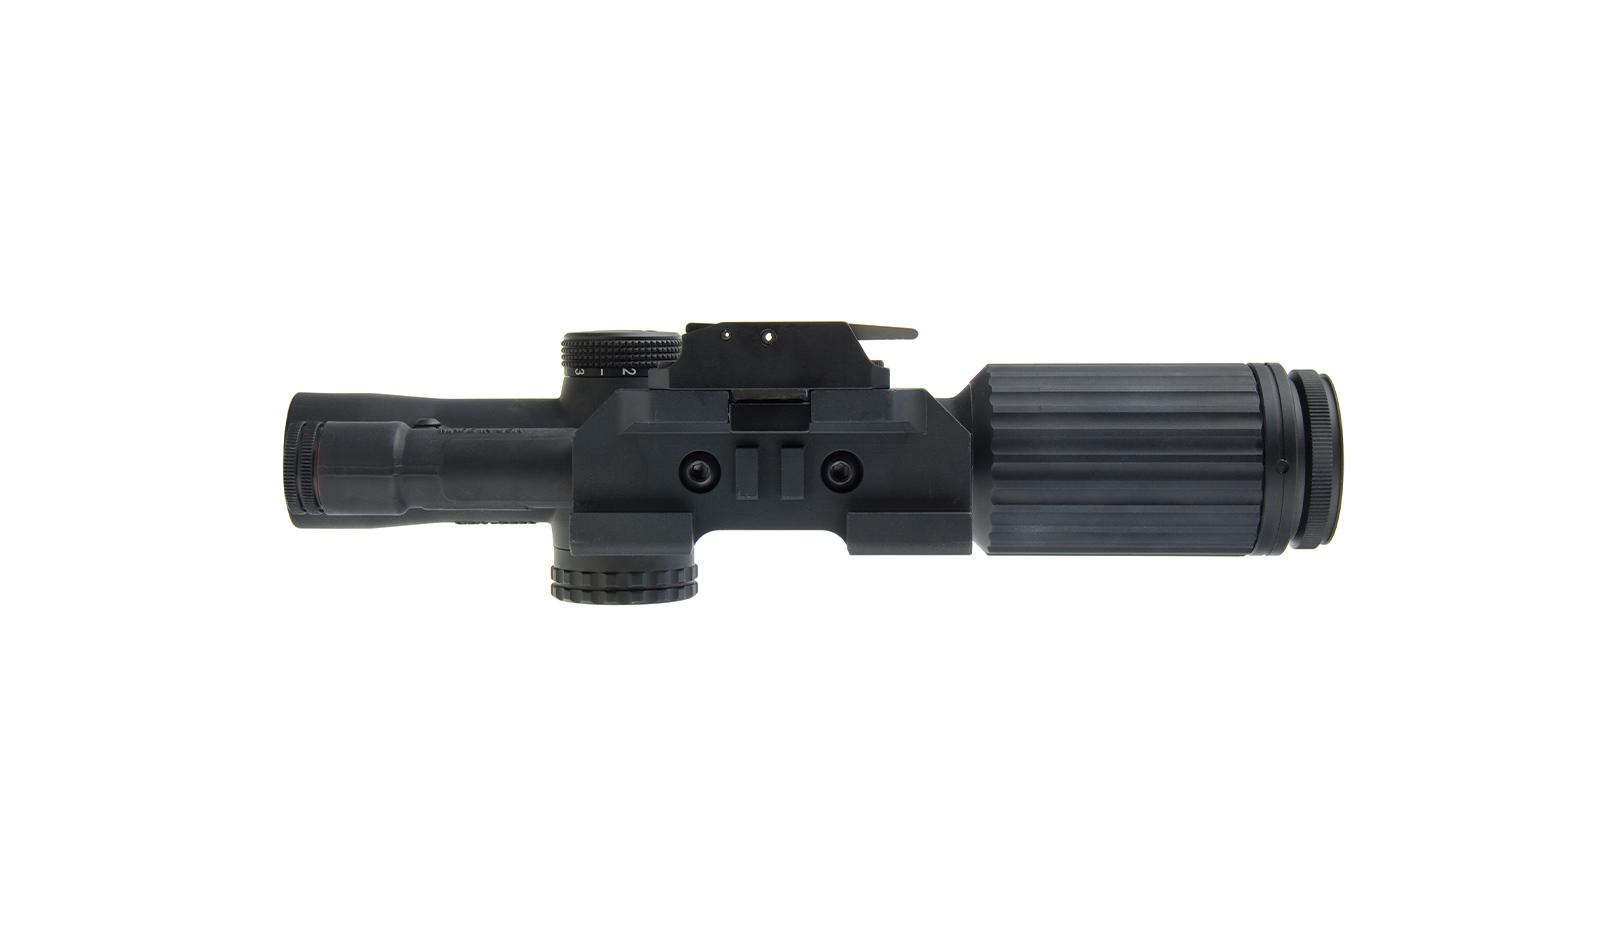 VC16-C-1600011 angle 10